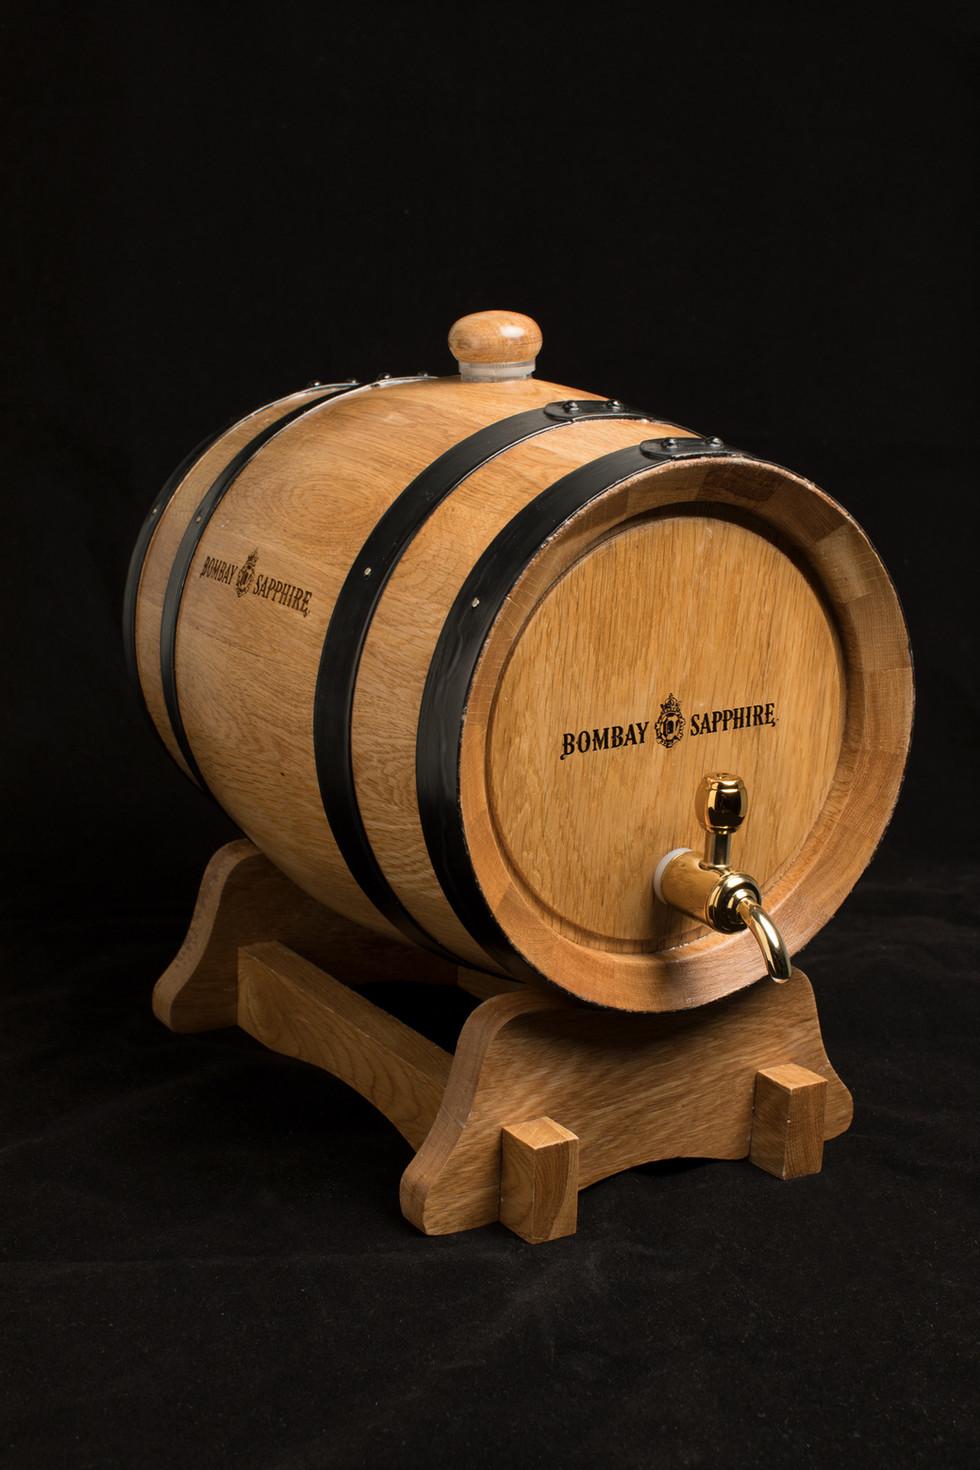 bombay-sapphire-barrel.jpg